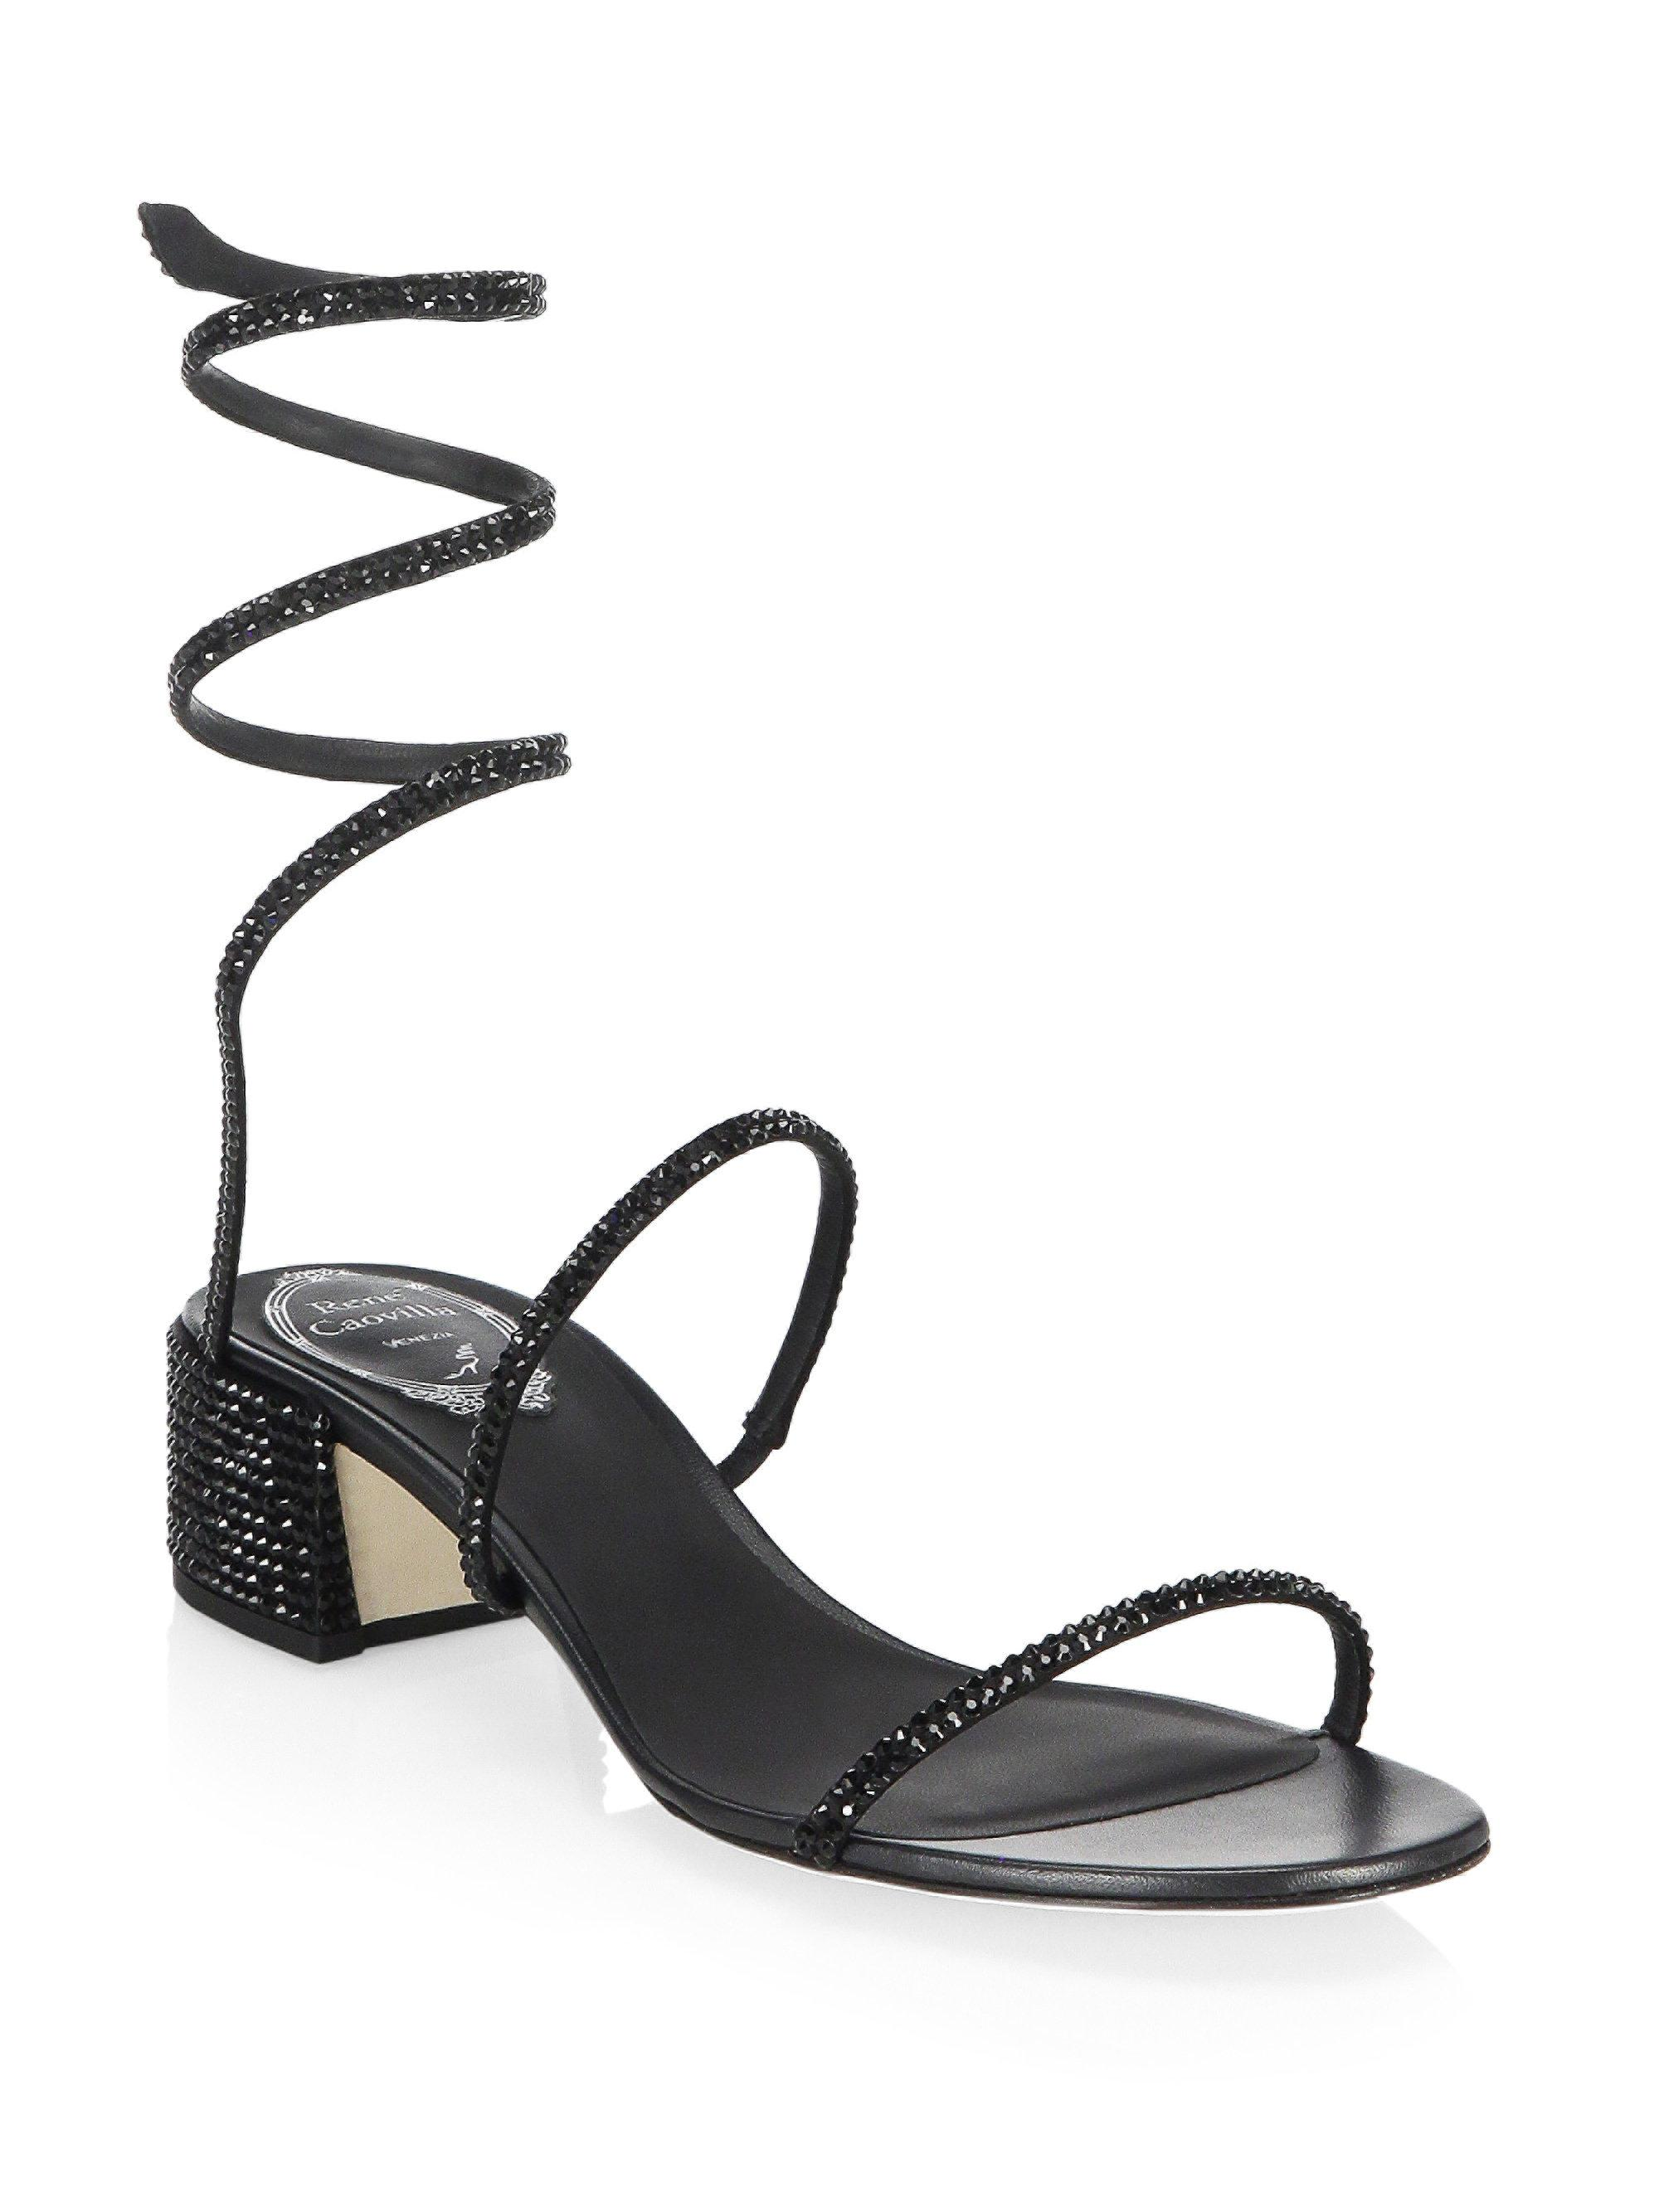 RENé CAOVILLA Leather Block Heel Sandals Zjd0KiBD